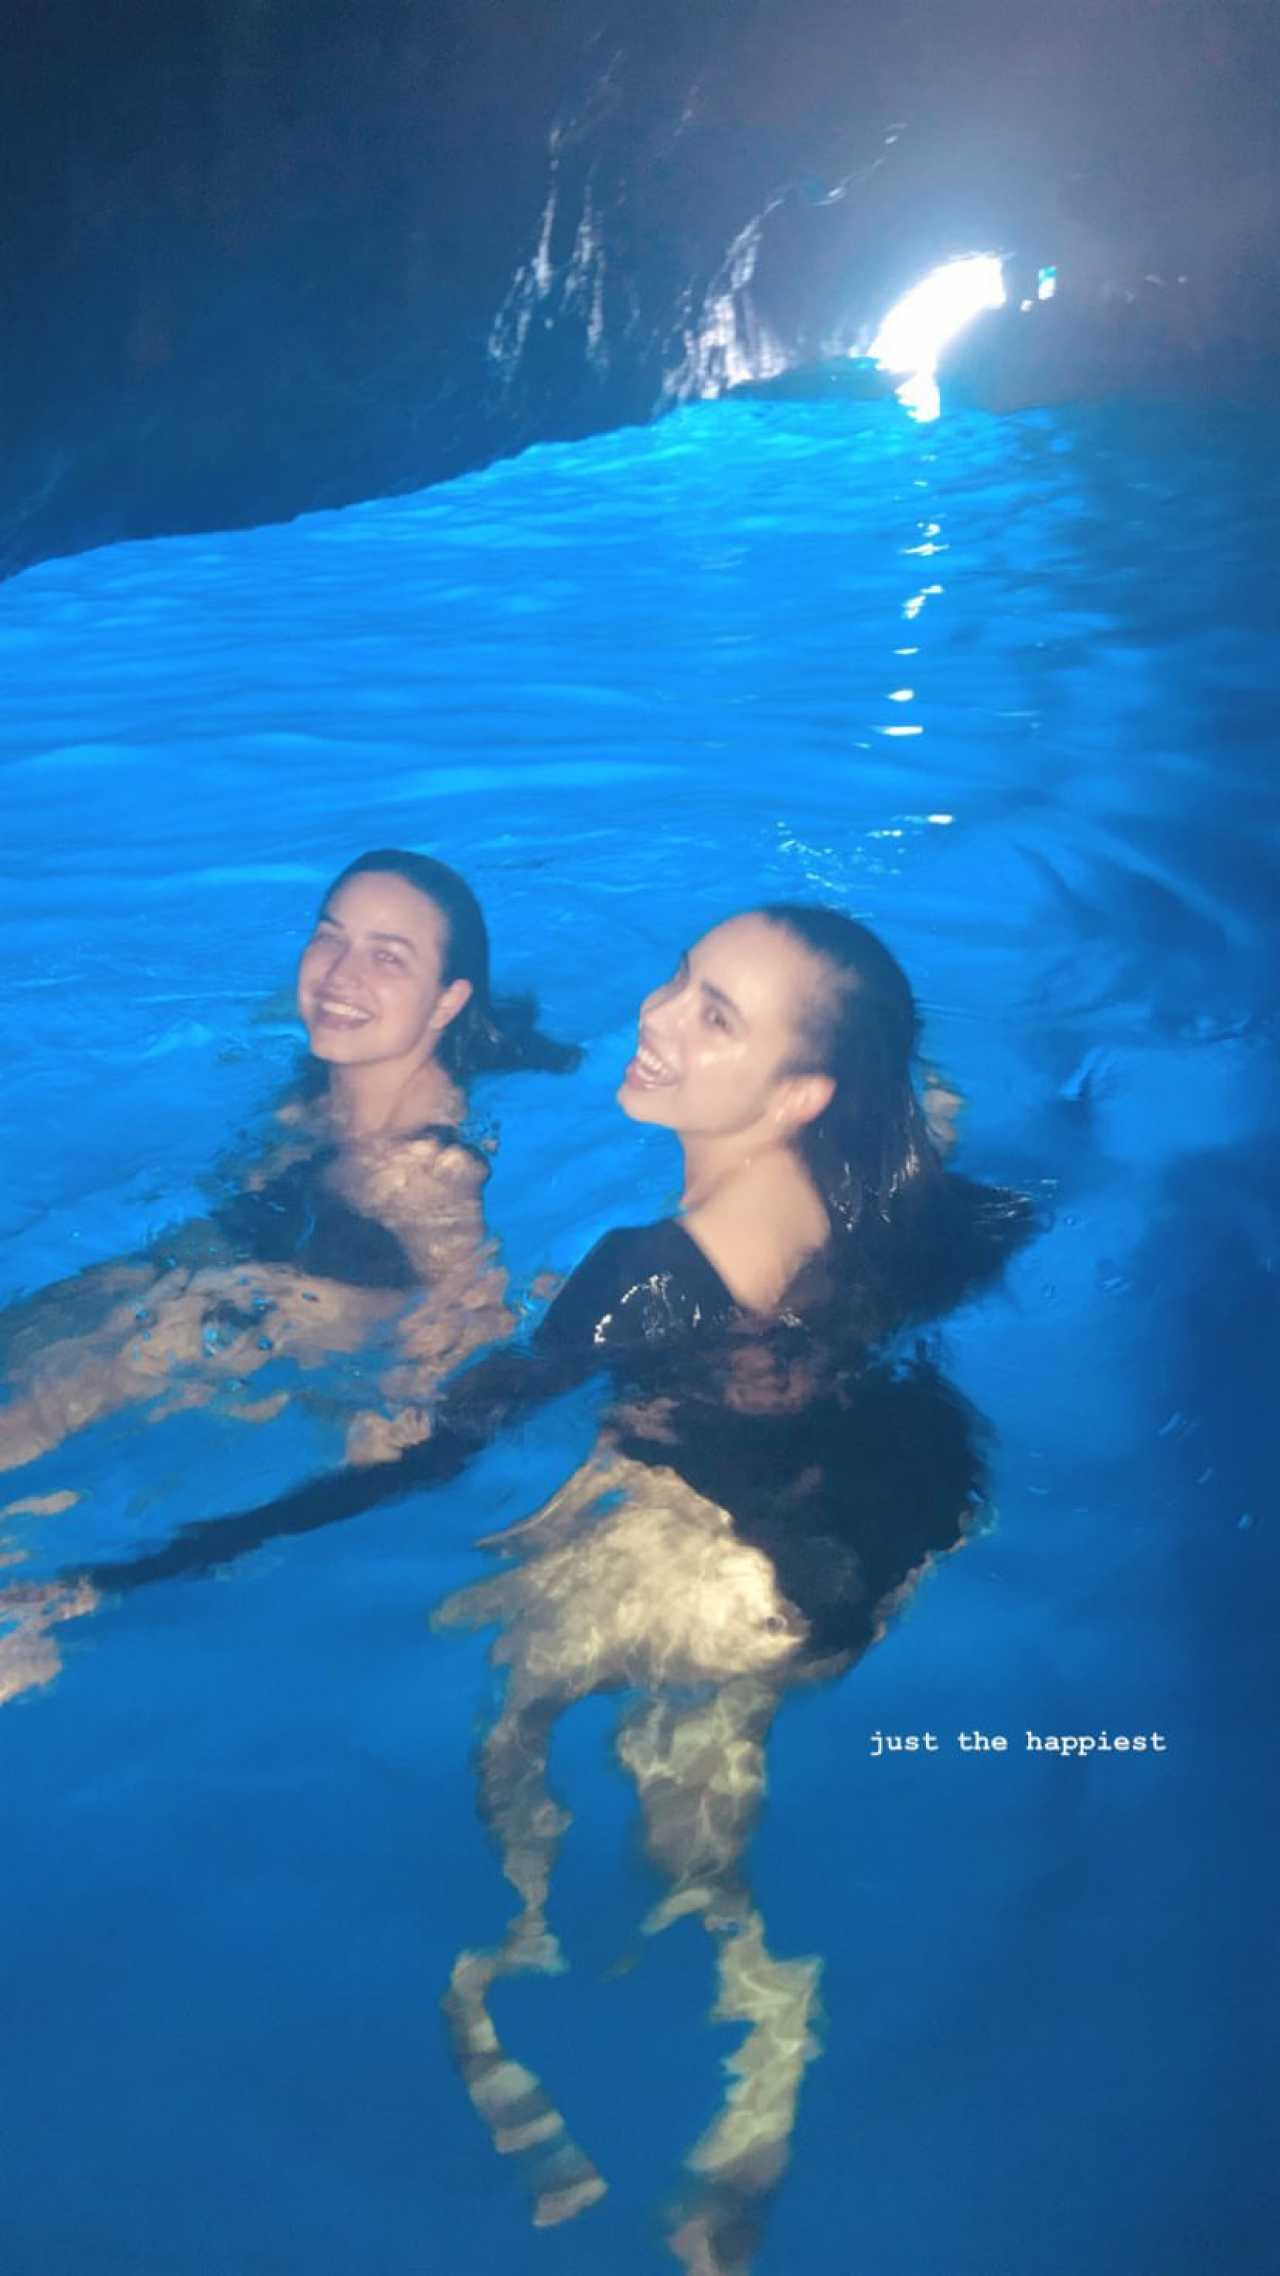 Sofia Carson 2020 : Sofia Carson – Instagram and social media pics-129